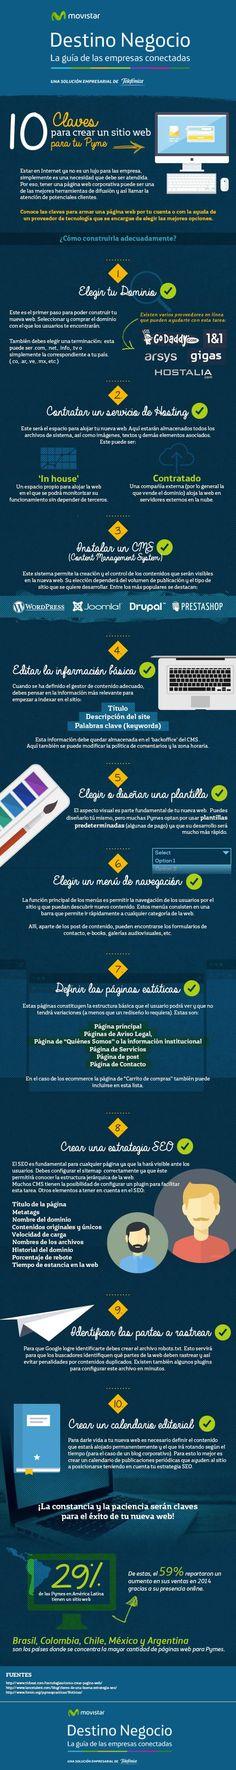 10 claves para crear una página web para empresas #infografia #infographic #marketing